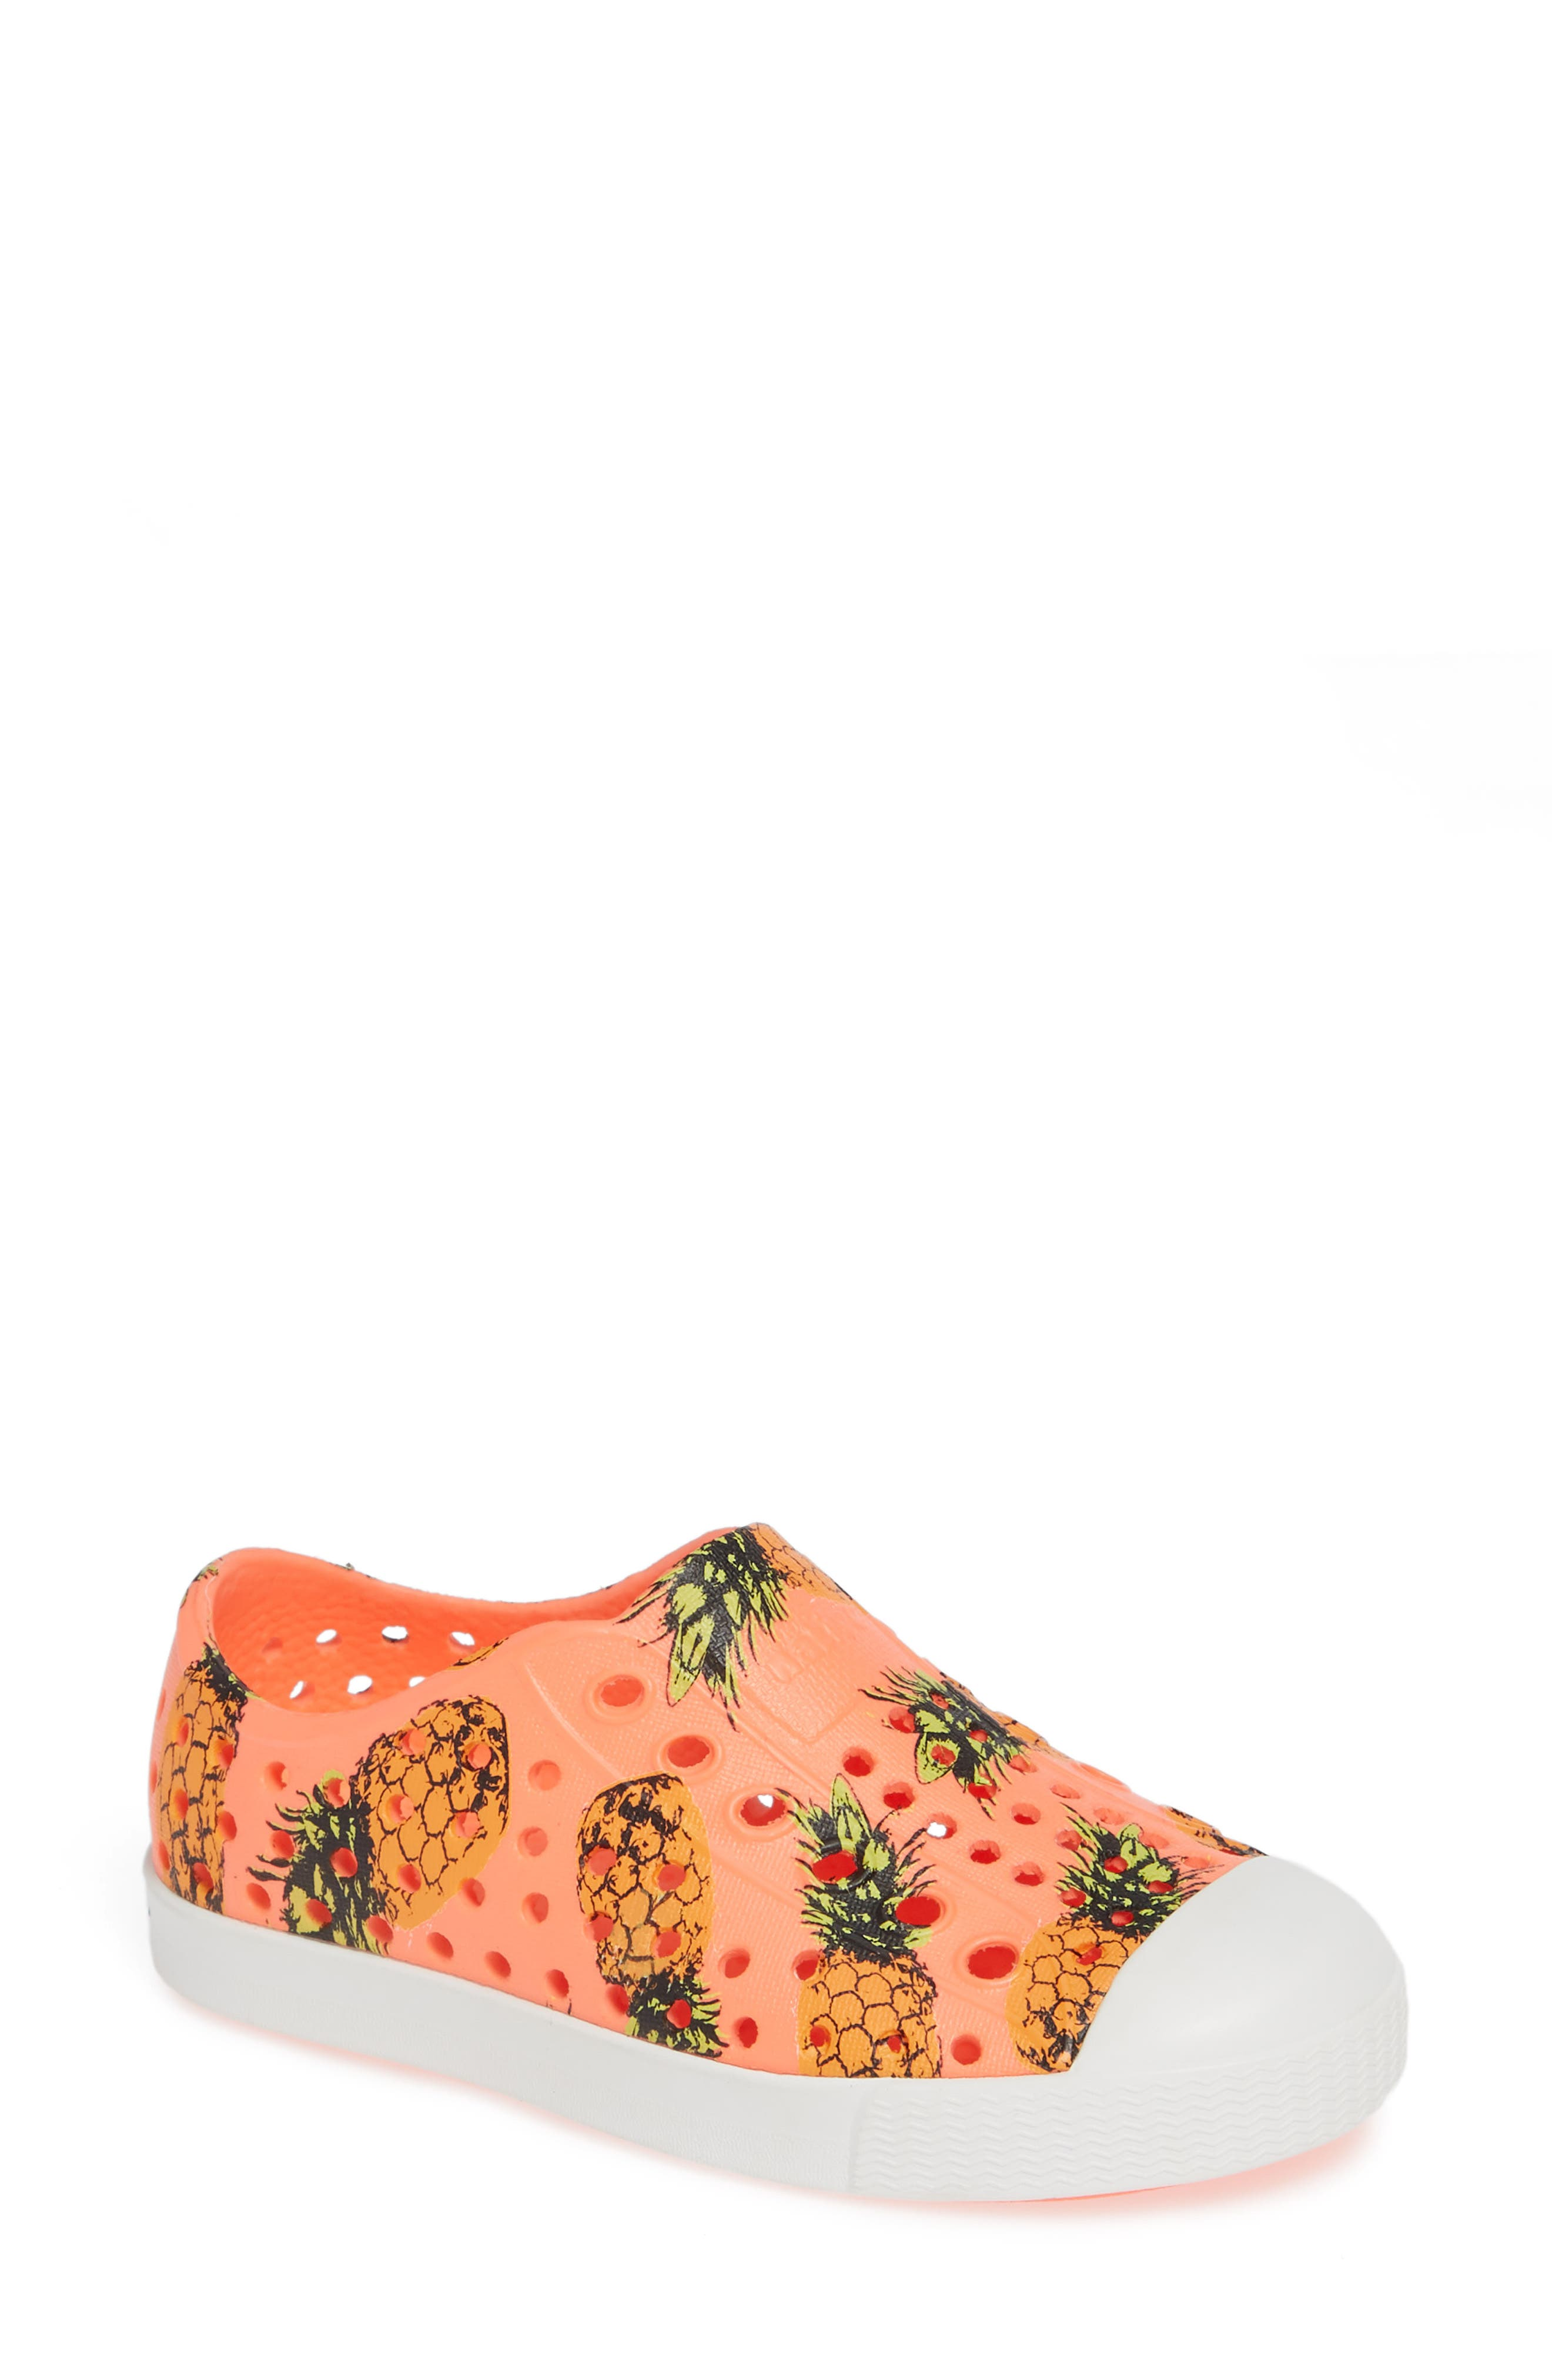 Jefferson Quartz Slip-On Sneaker,                             Main thumbnail 1, color,                             725